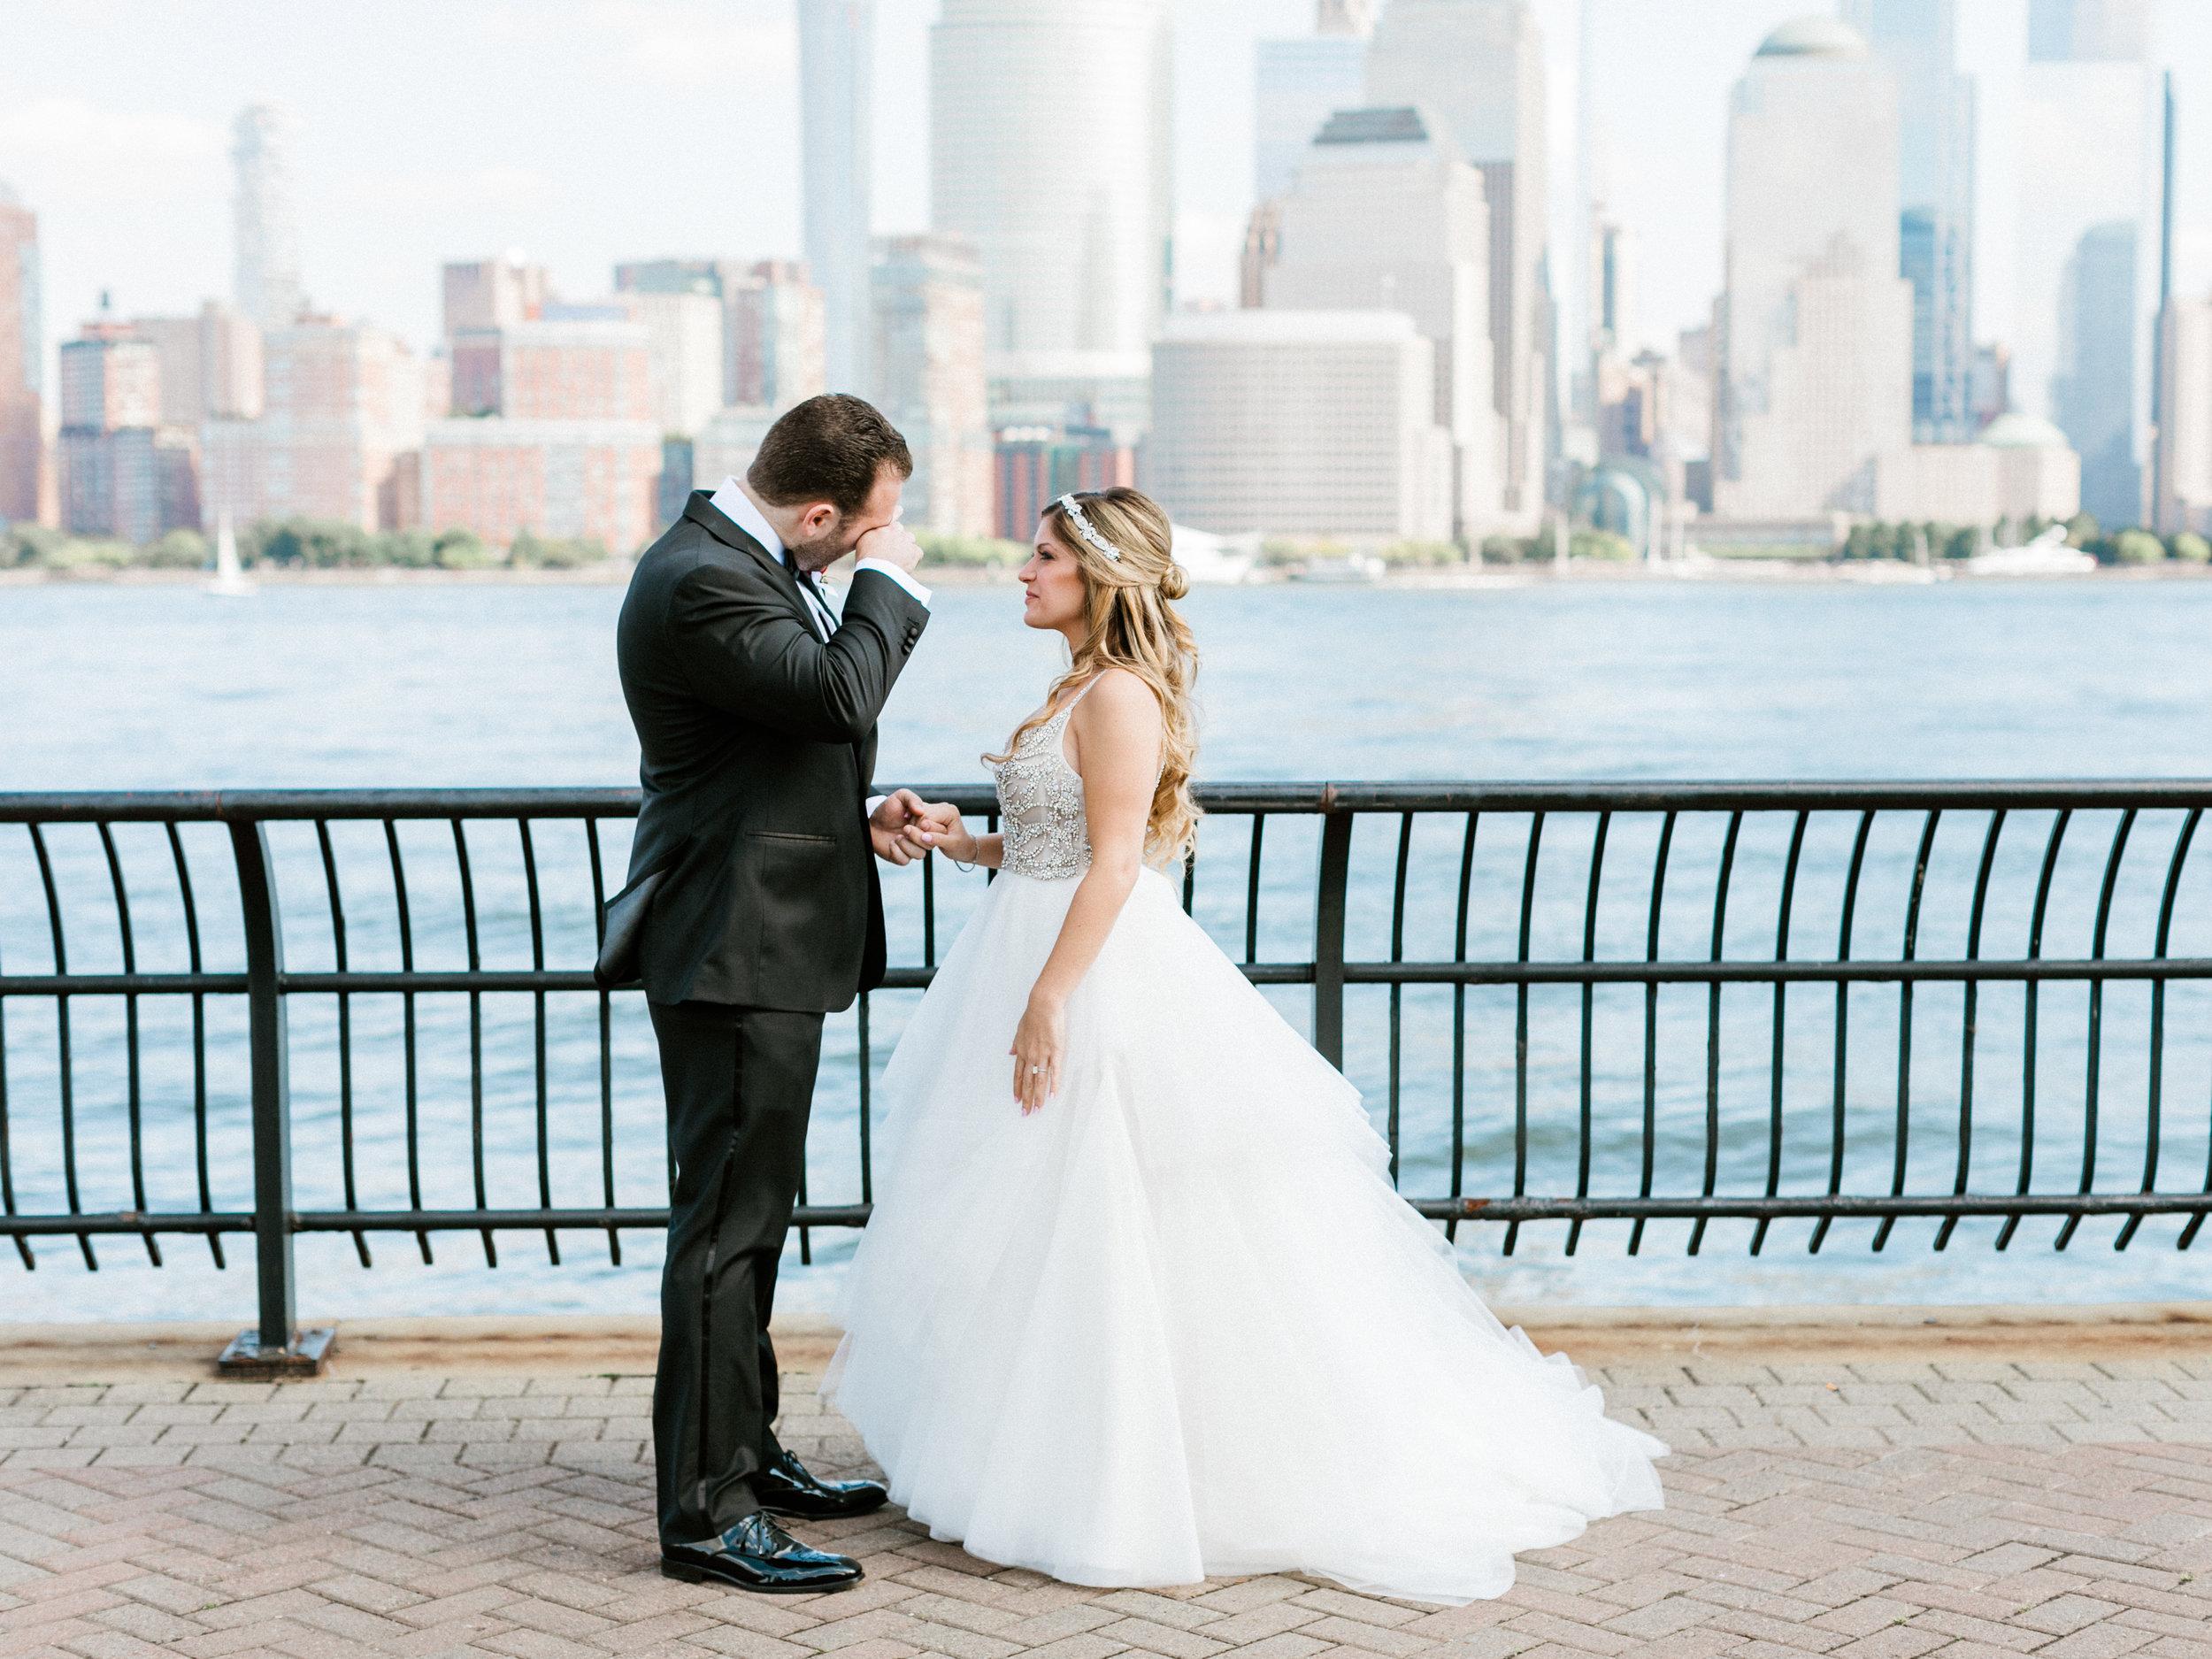 hyatt-regency-jersey-city-wedding-photographer21.jpg